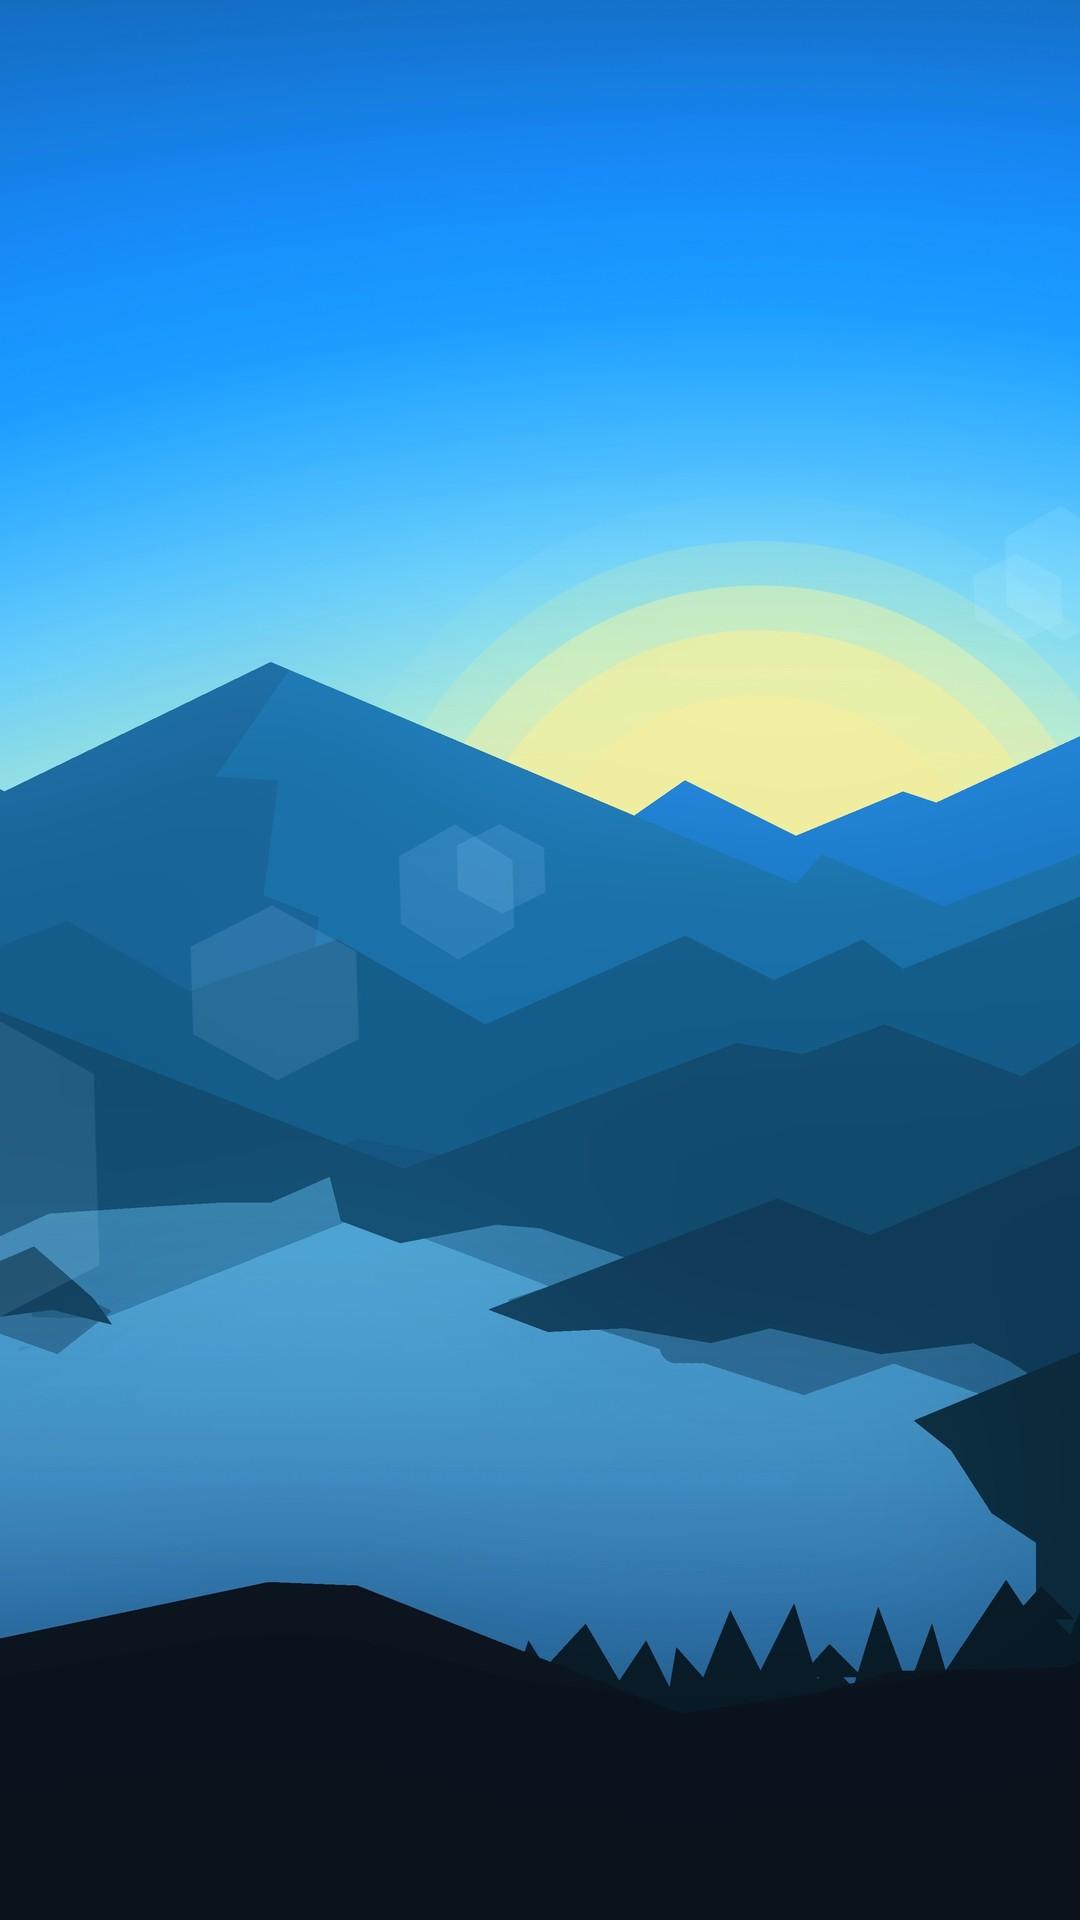 Must see Wallpaper Mountain Nokia - Forest-Mountains-Sunset-Cool-Weather-Minimalism-Yn-Wallpaper-1080x1920  Snapshot_174863.jpg